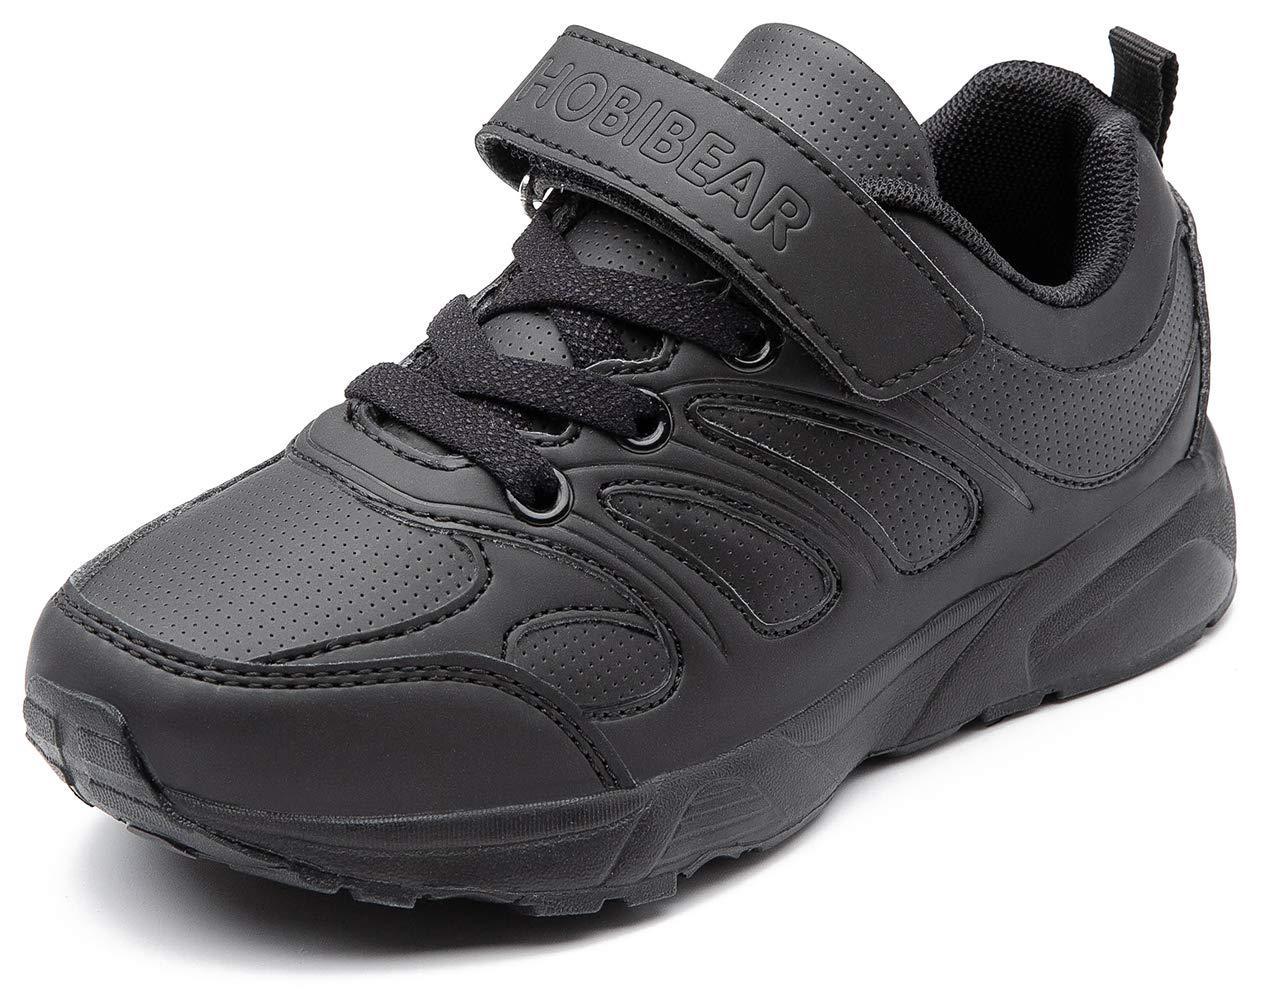 GUBARUN Sneakers for Boys and Girls, Kids Running Lightweight Shoes - Athletic Tennis Shoe Comfort-12.5M,Black